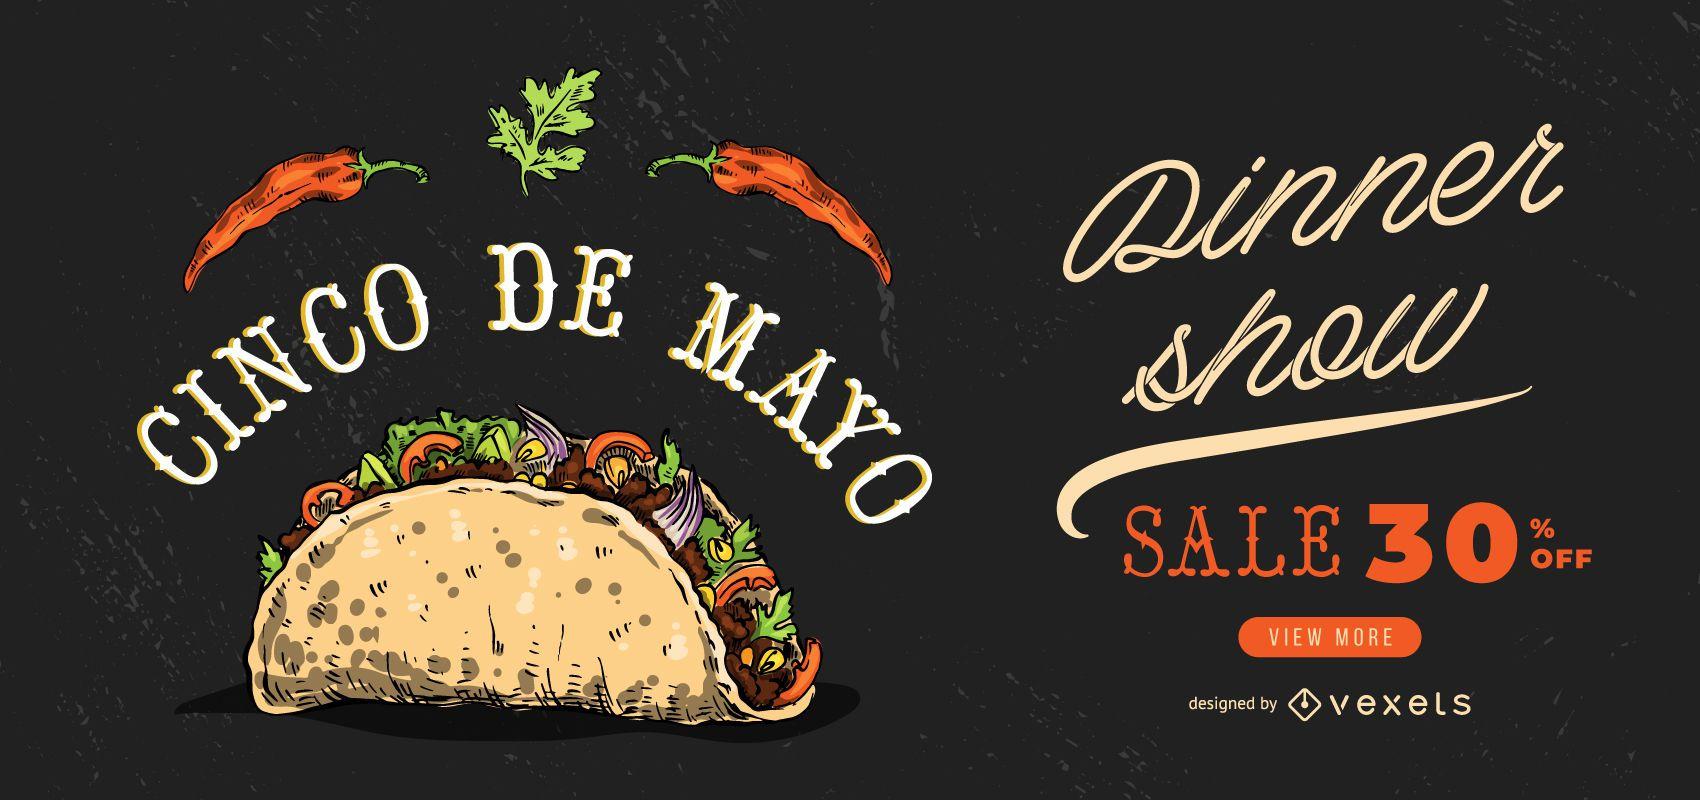 Cinco de Mayo Landscape Banner Design